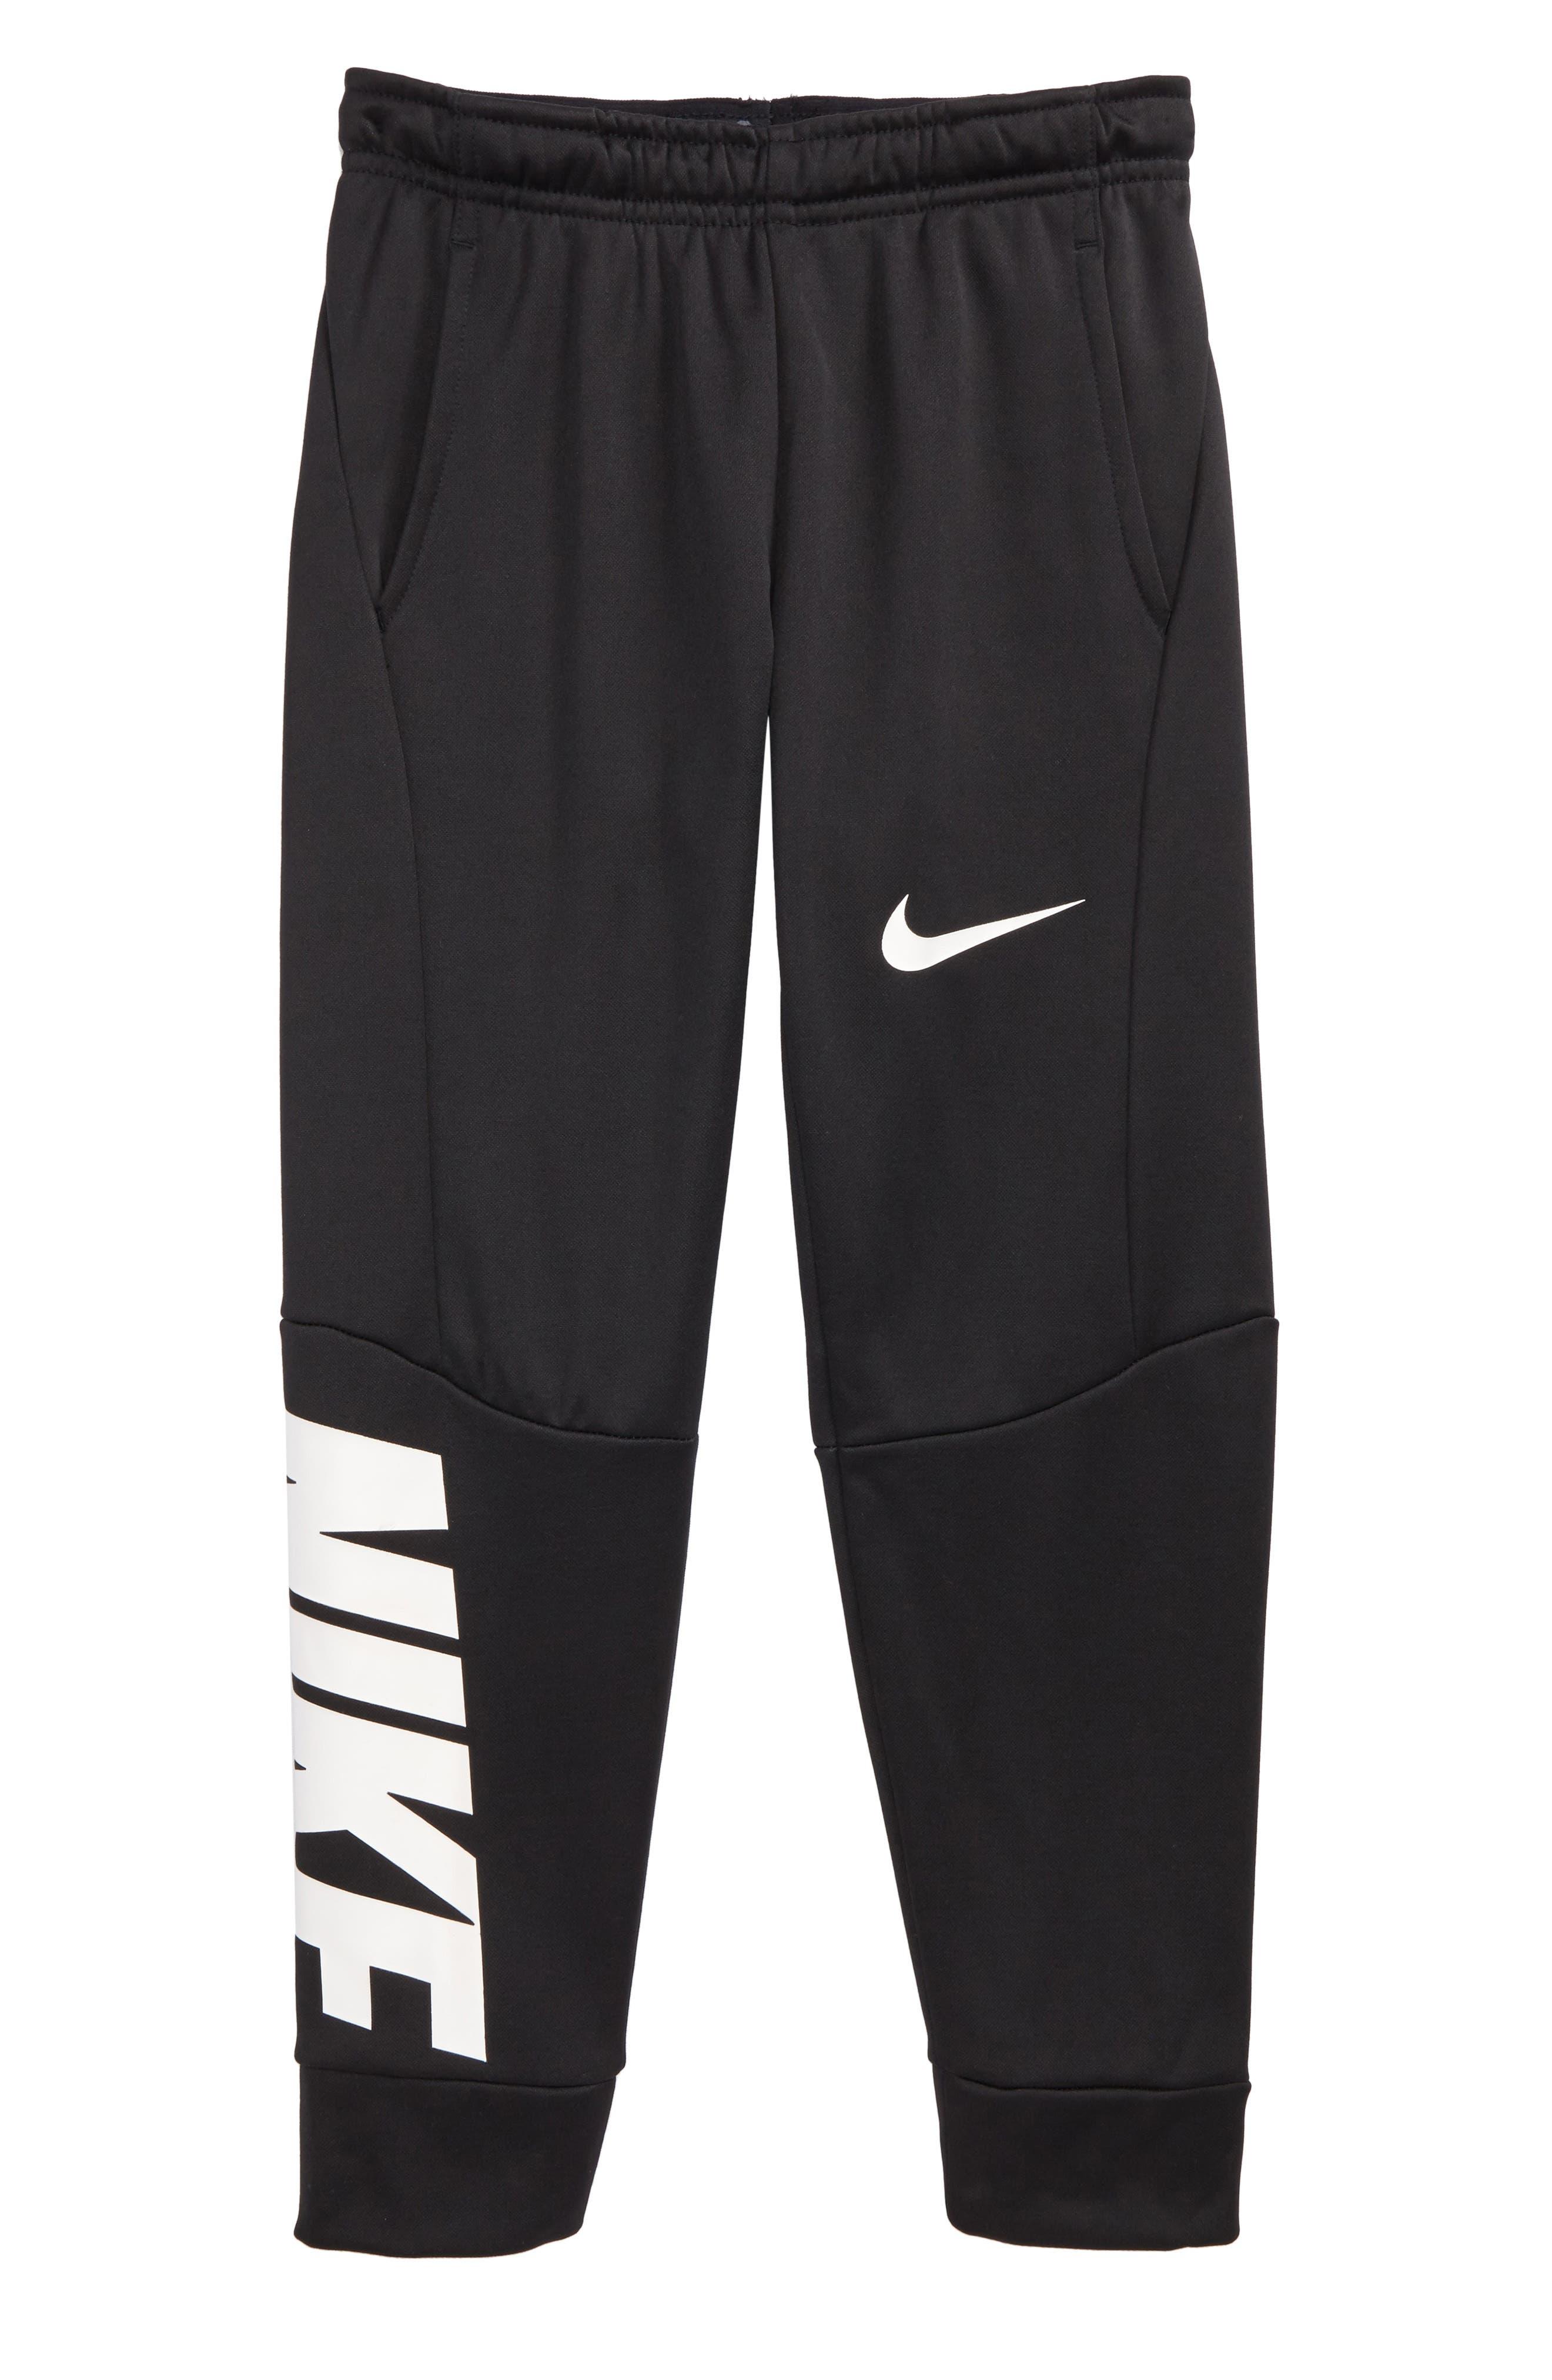 Alternate Image 1 Selected - Nike Therma-FIT GFX Fleece Jogger Pants (Toddler Boys & Little Boys)